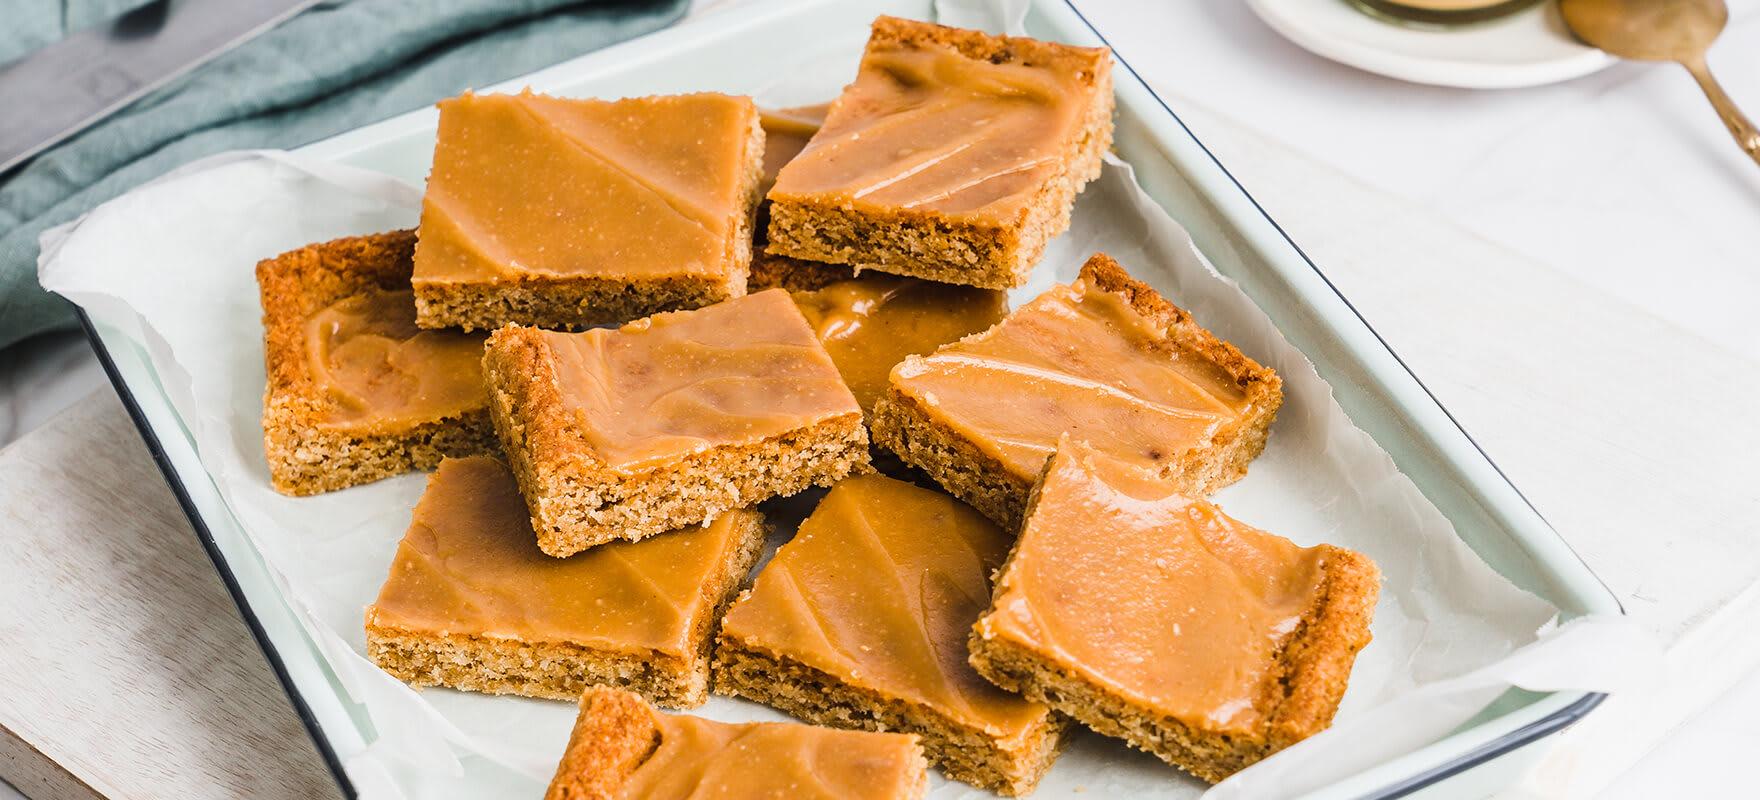 Peanut butter Weet-Bix™ slice image 2